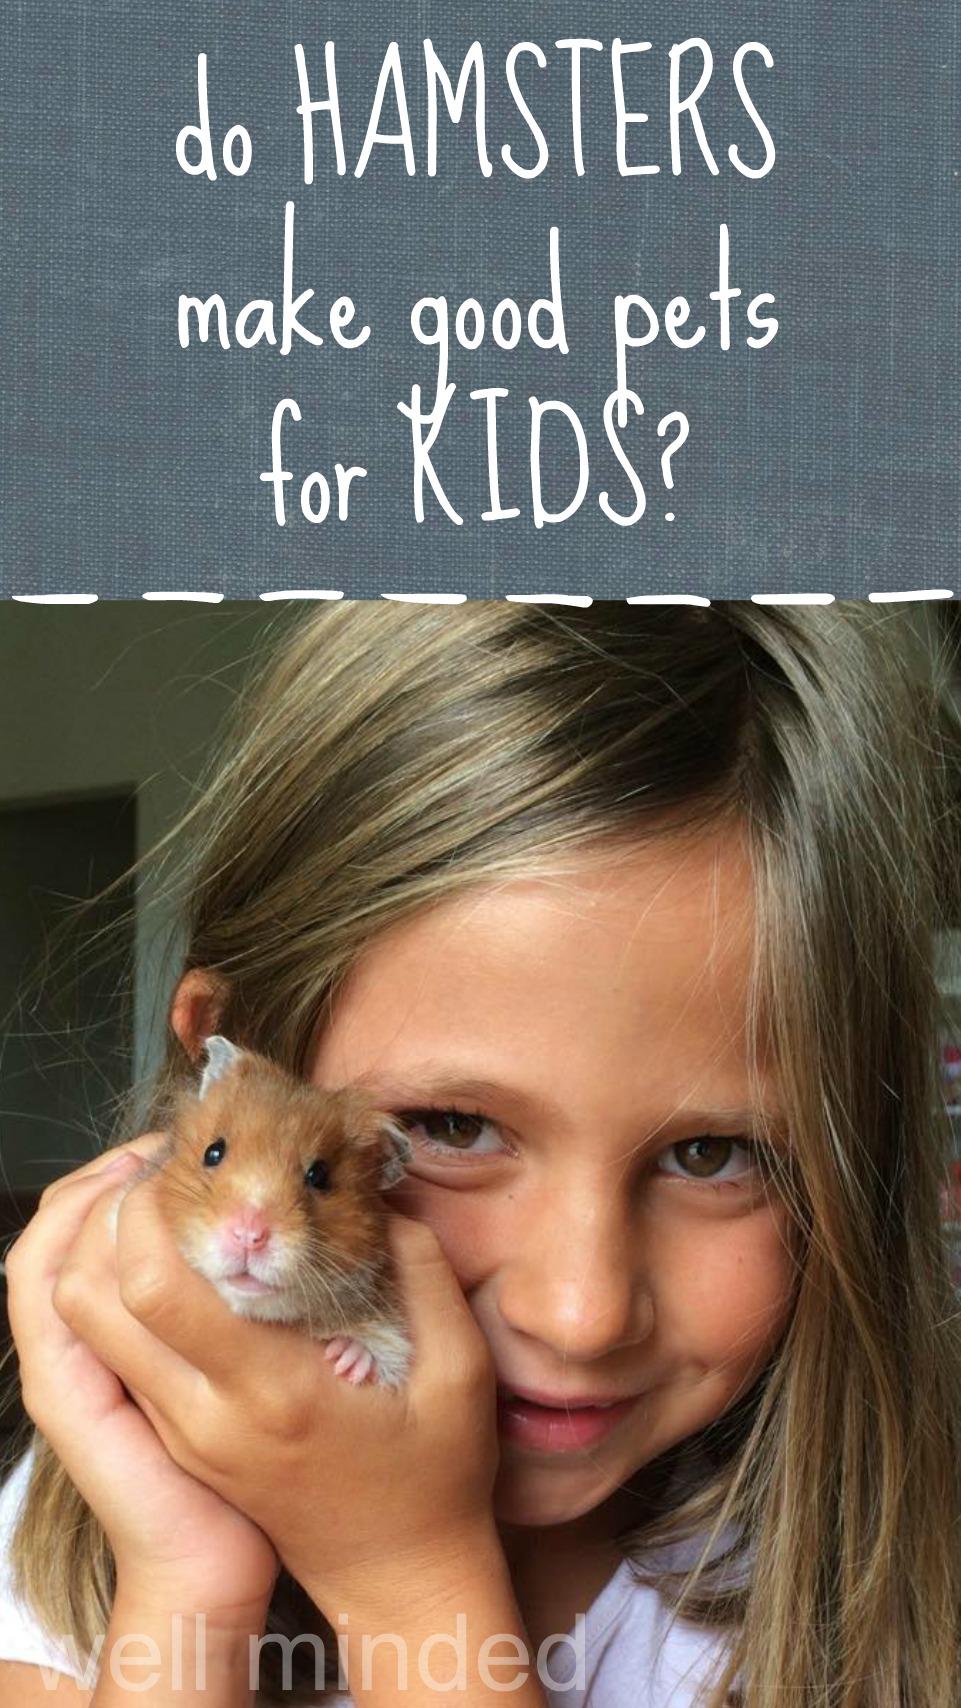 Do hamsters make good pets for kids?